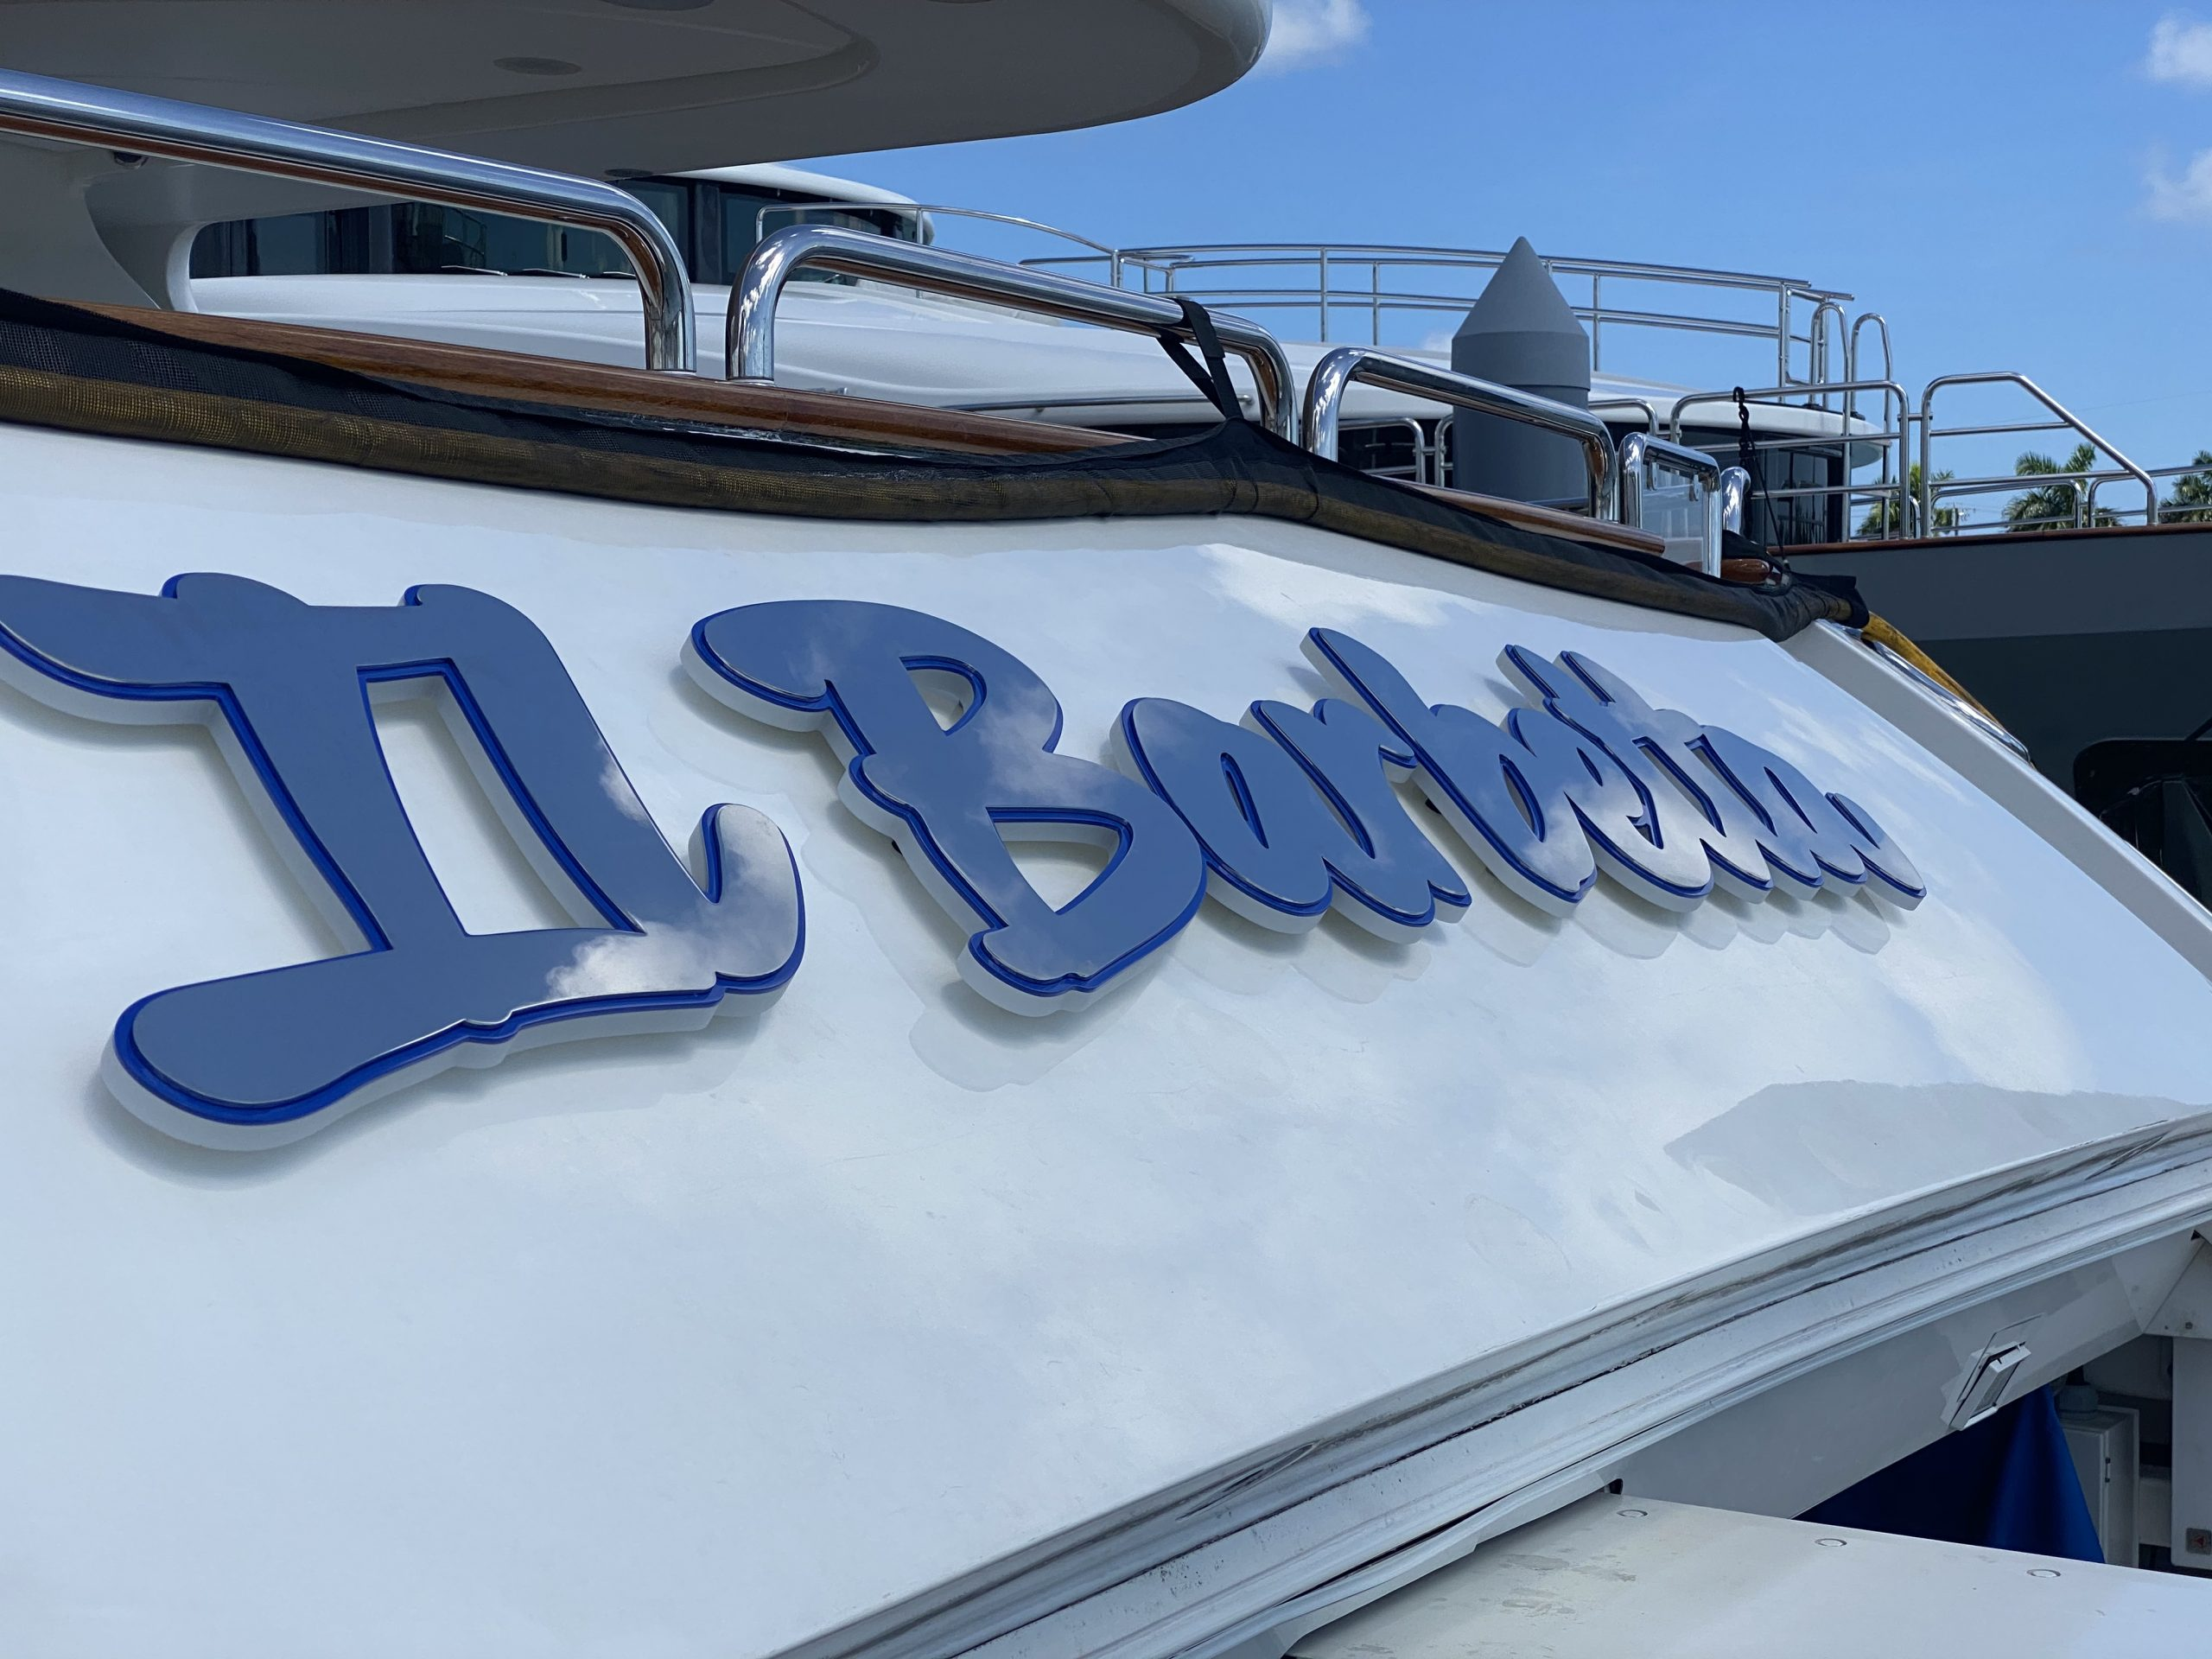 Yacht Signs Il Barbetta